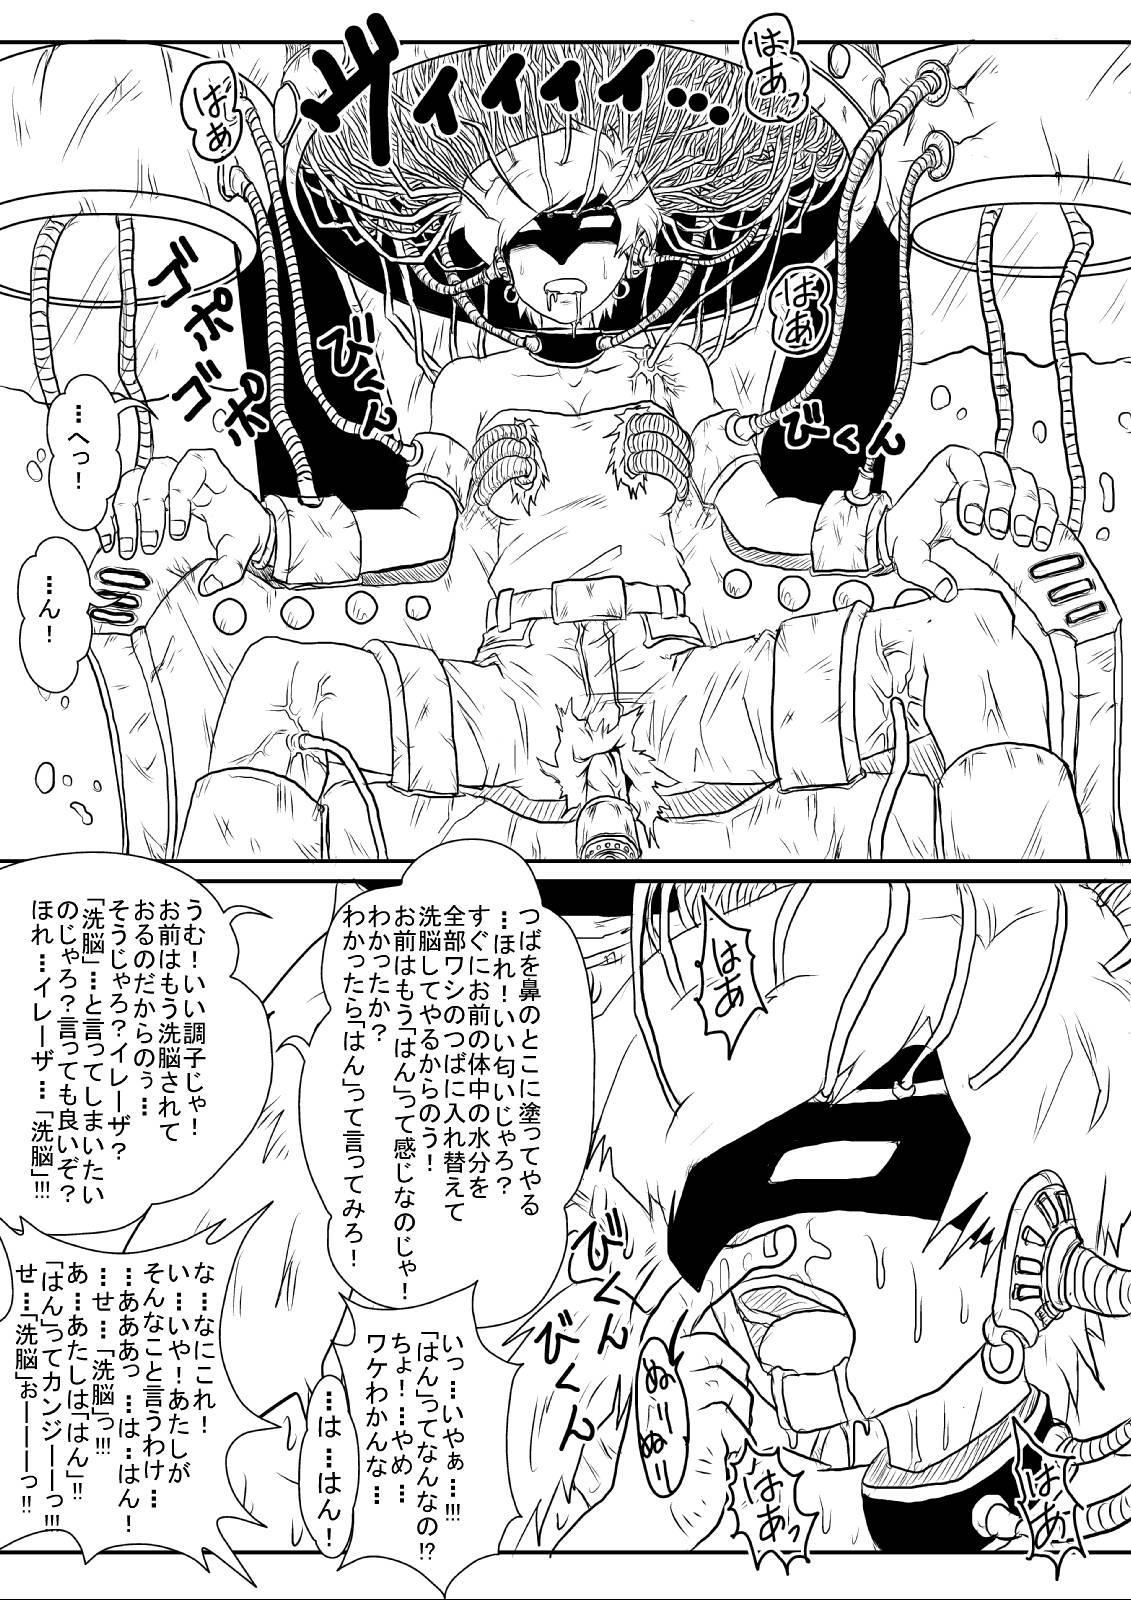 [Alice.Blood] Sennou Kyouiku-shitsu~ Jinzou ☆-kan 18-gou-hen (Dragon Ball Z) 18